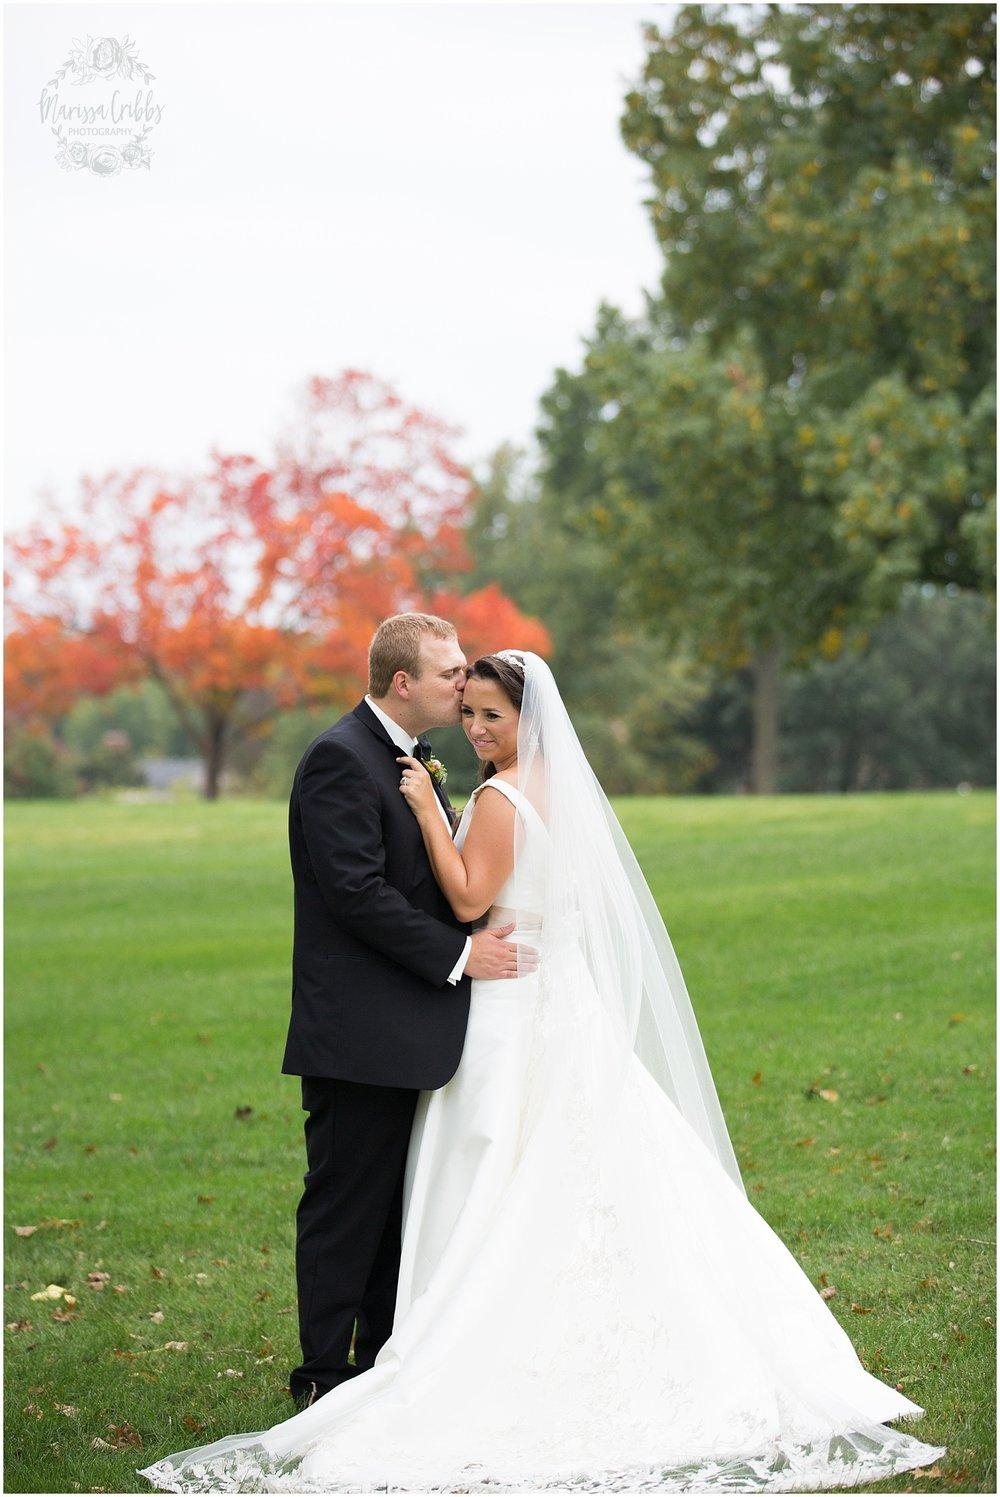 Blue Hills Country Club Wedding | Marissa Cribbs Photography | Nolte's Bridal | KC Wedding Photographer | KC Weddings_1171.jpg